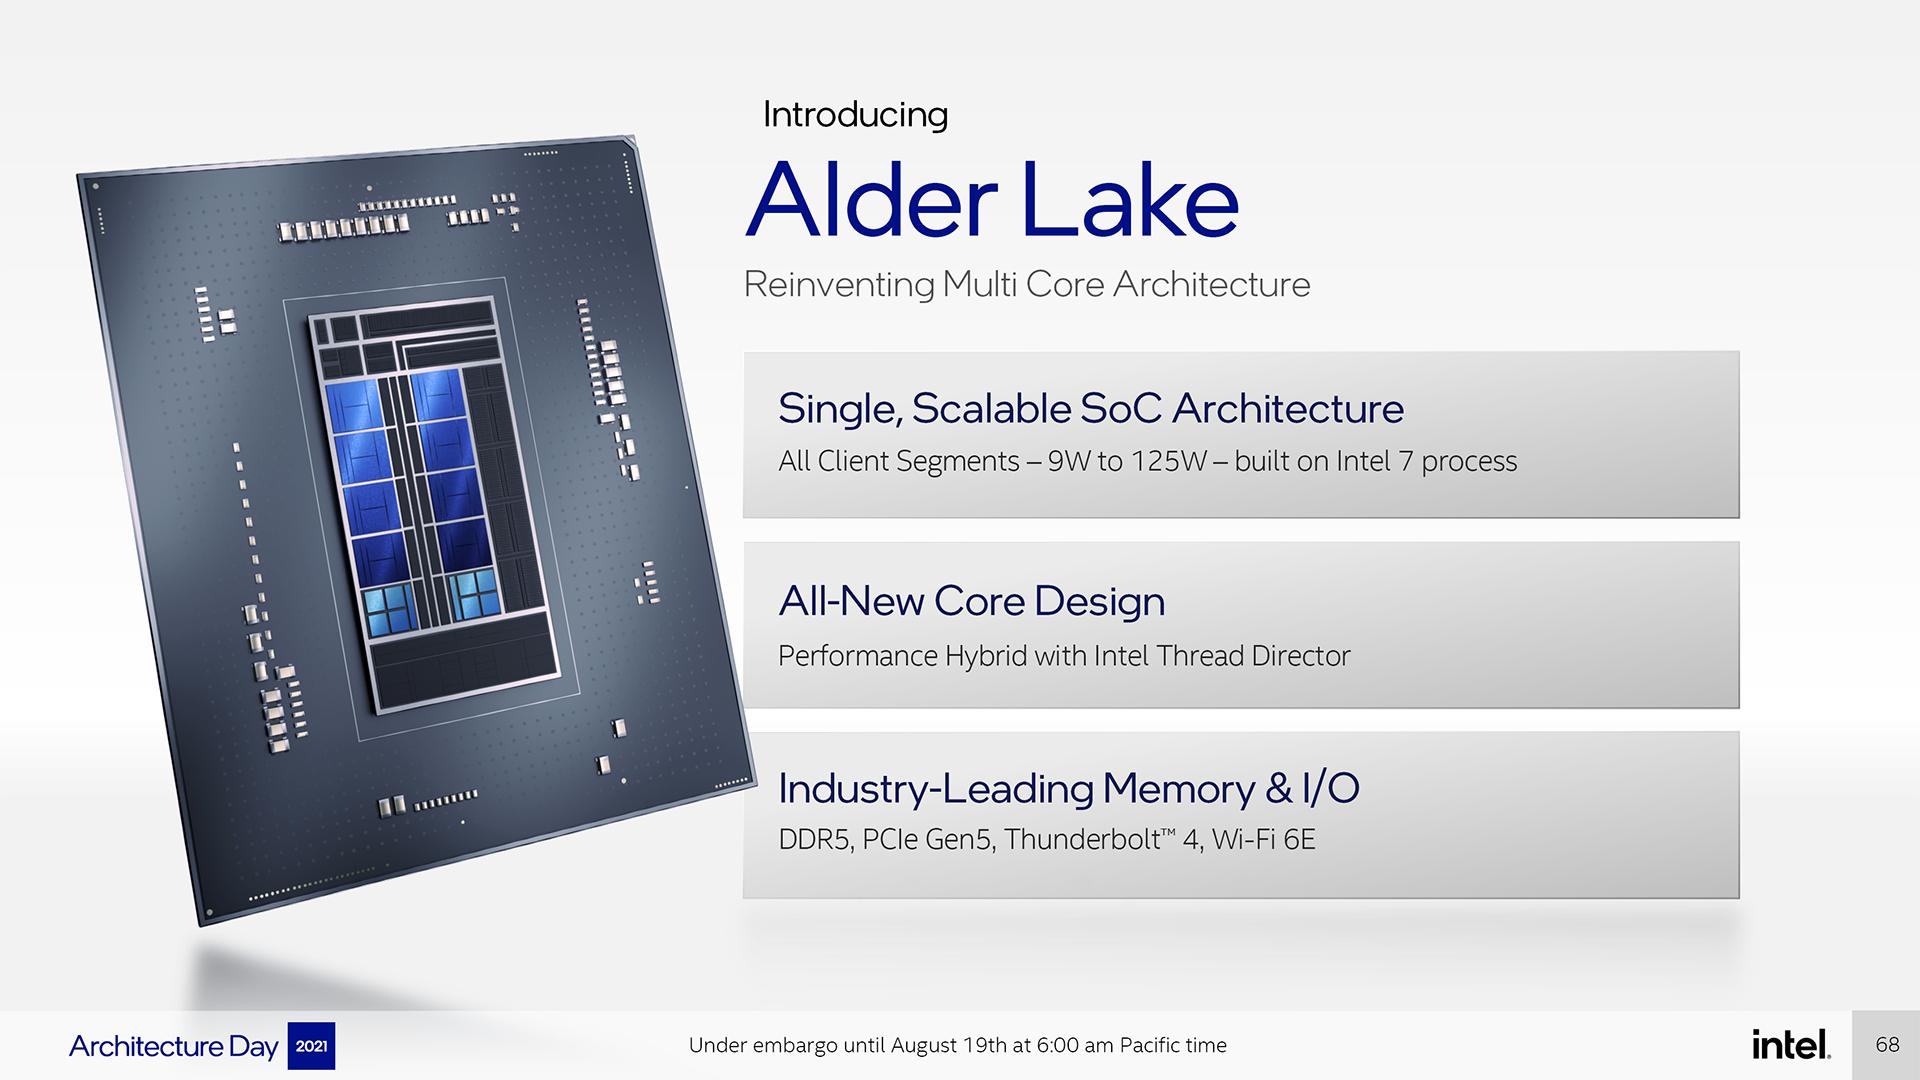 Intel Core i9-12900K опередил AMD Ryzen 9 5950X в многопоточном тесте Cinebench R23